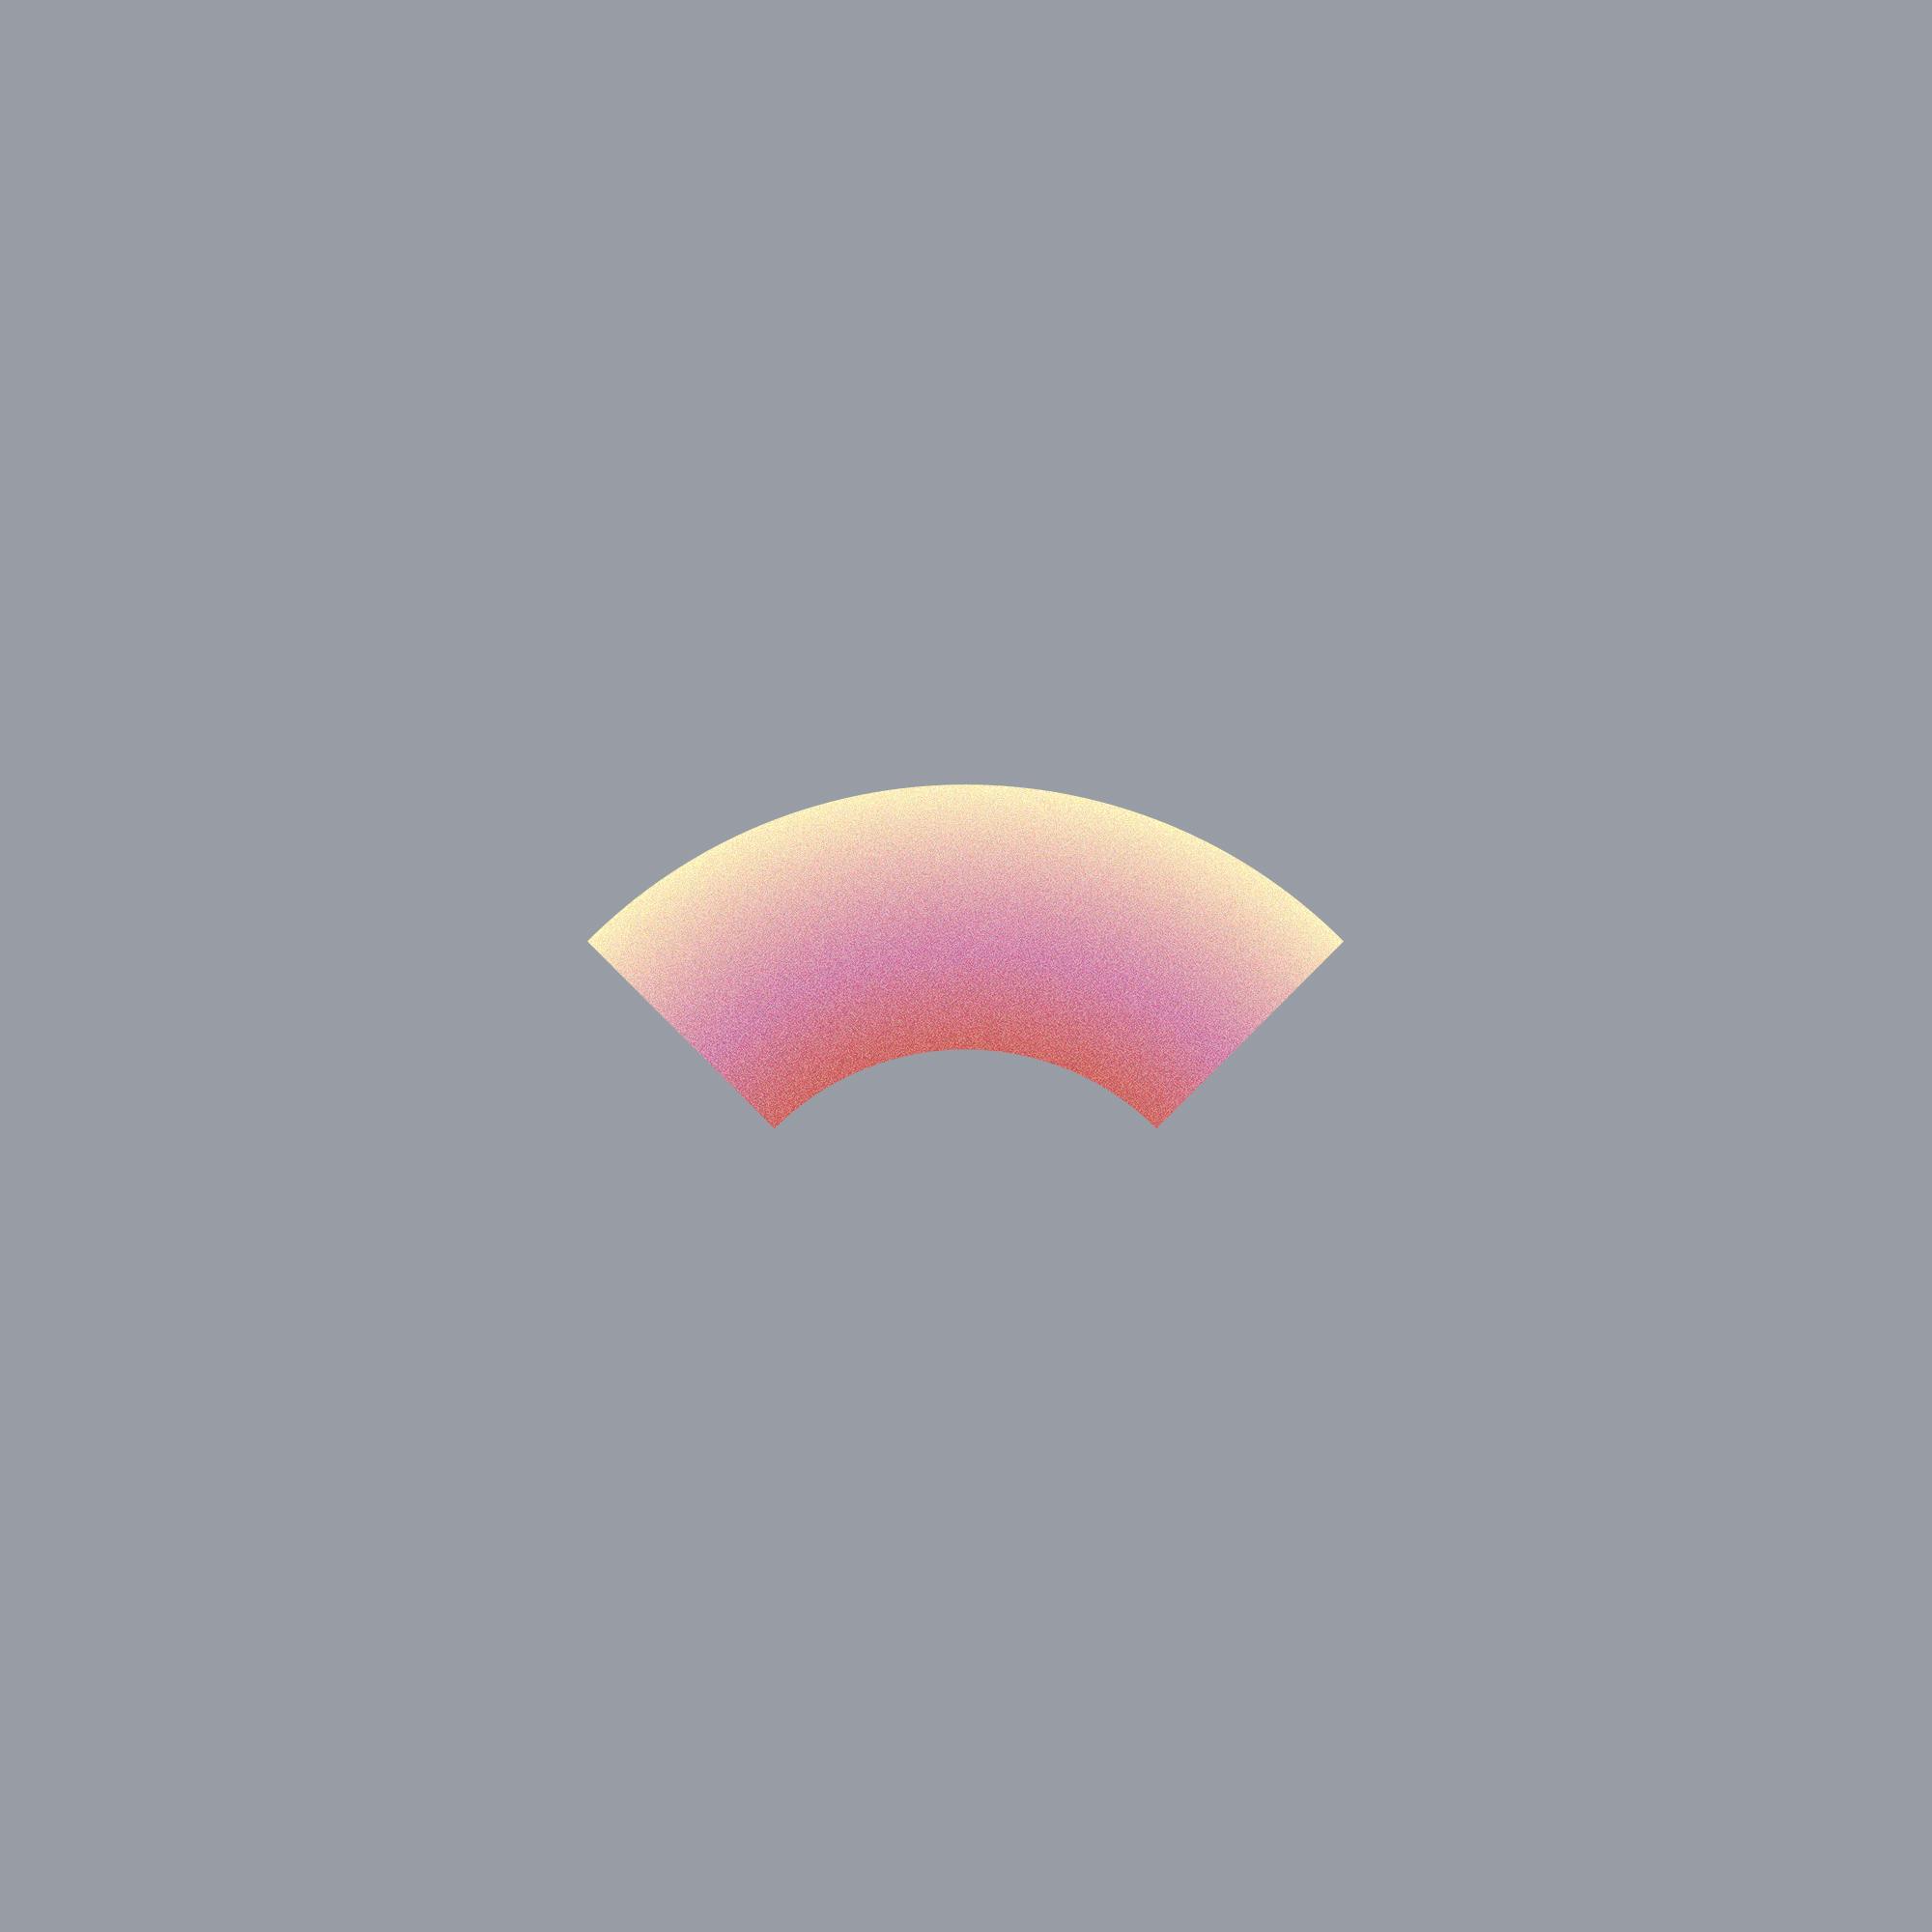 color-experimentation_167.jpg